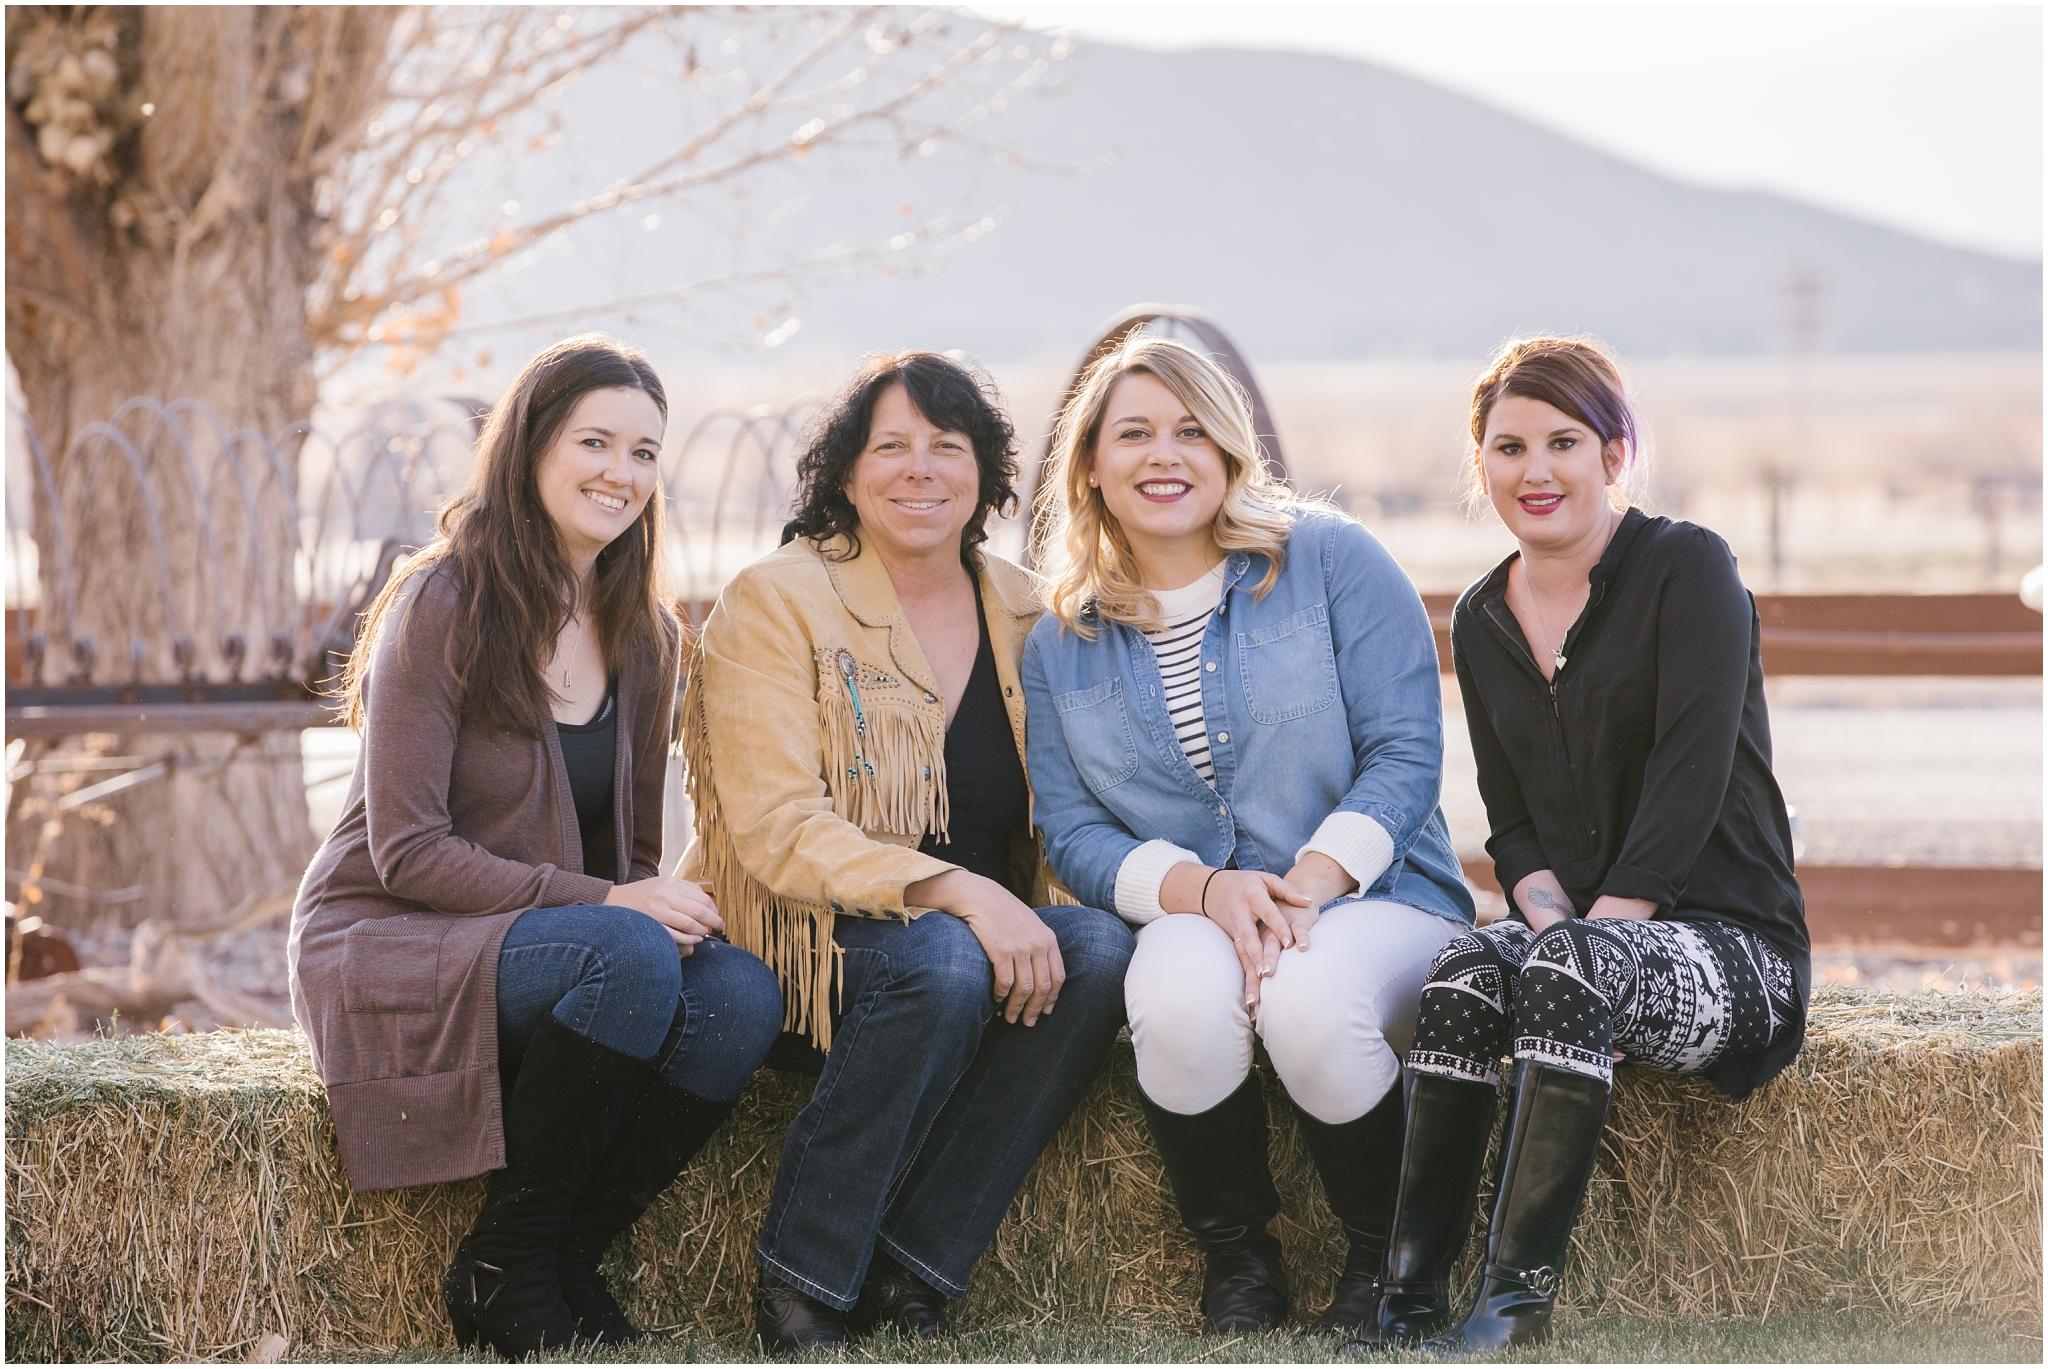 Conrad-32_Lizzie-B-Imagery-Utah-Family-Photographer-Utah-County-Central-Utah-Park-City-Extended-Family-Session.jpg